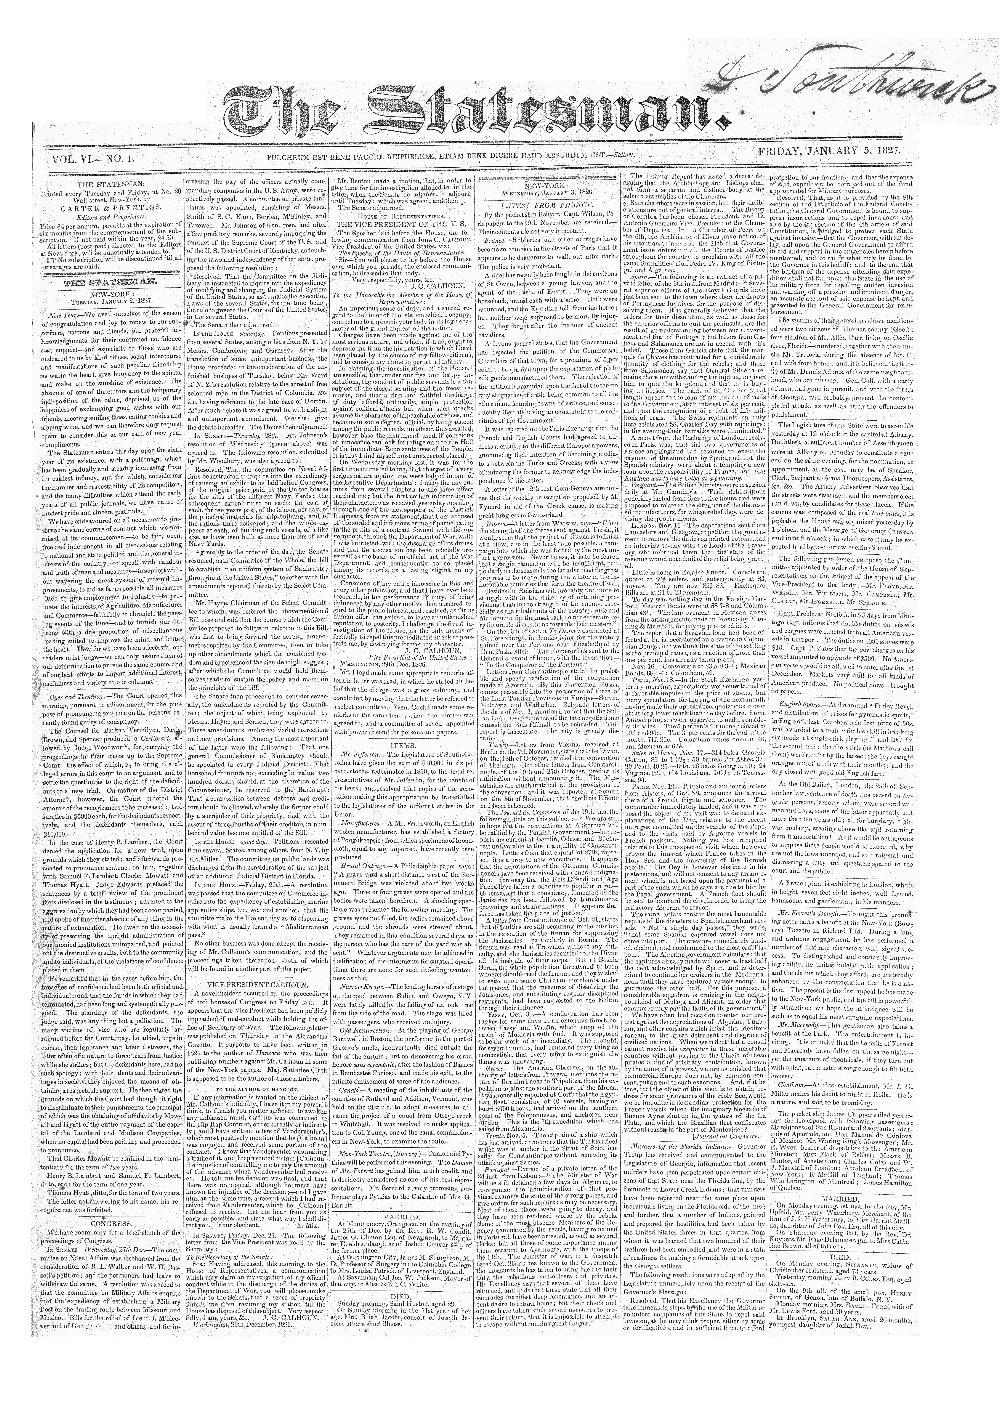 The statesman - page 1